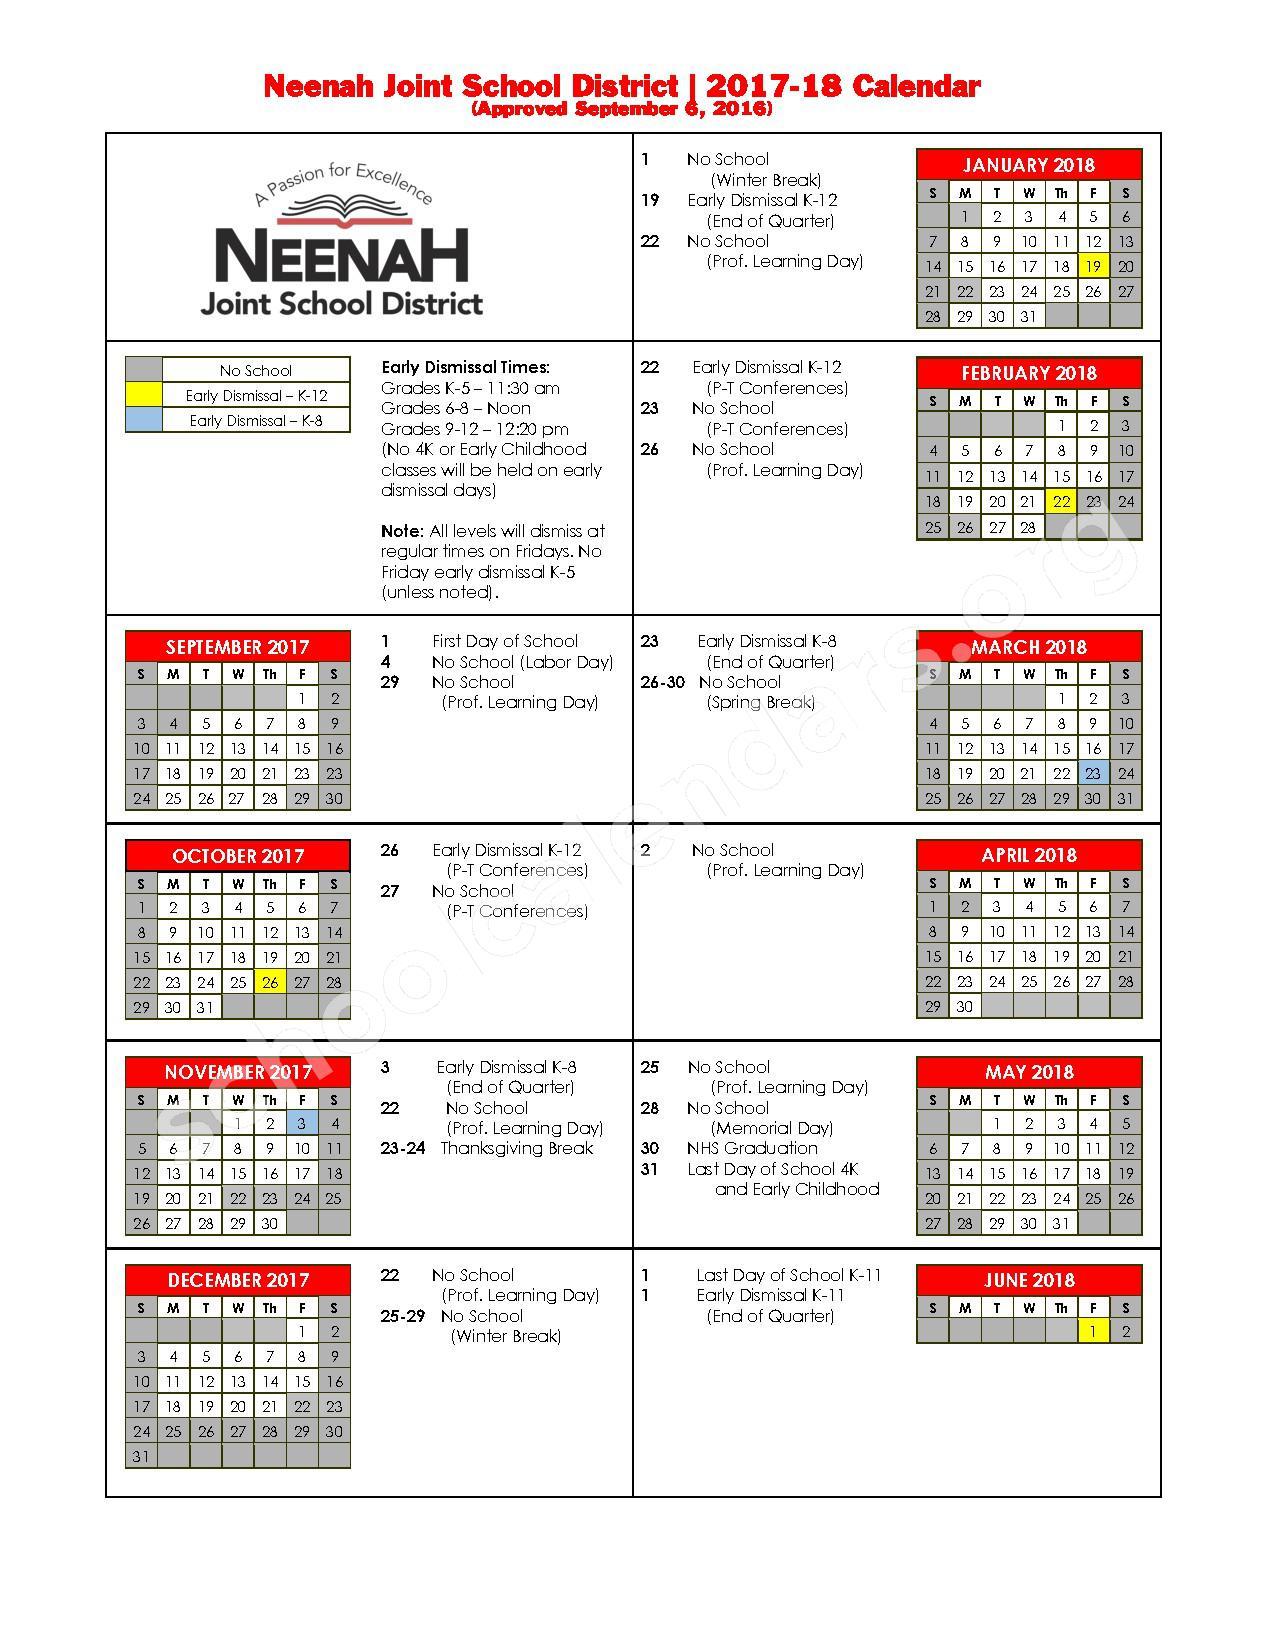 2017 - 2018 School Calendar – Neenah Joint School District – page 1